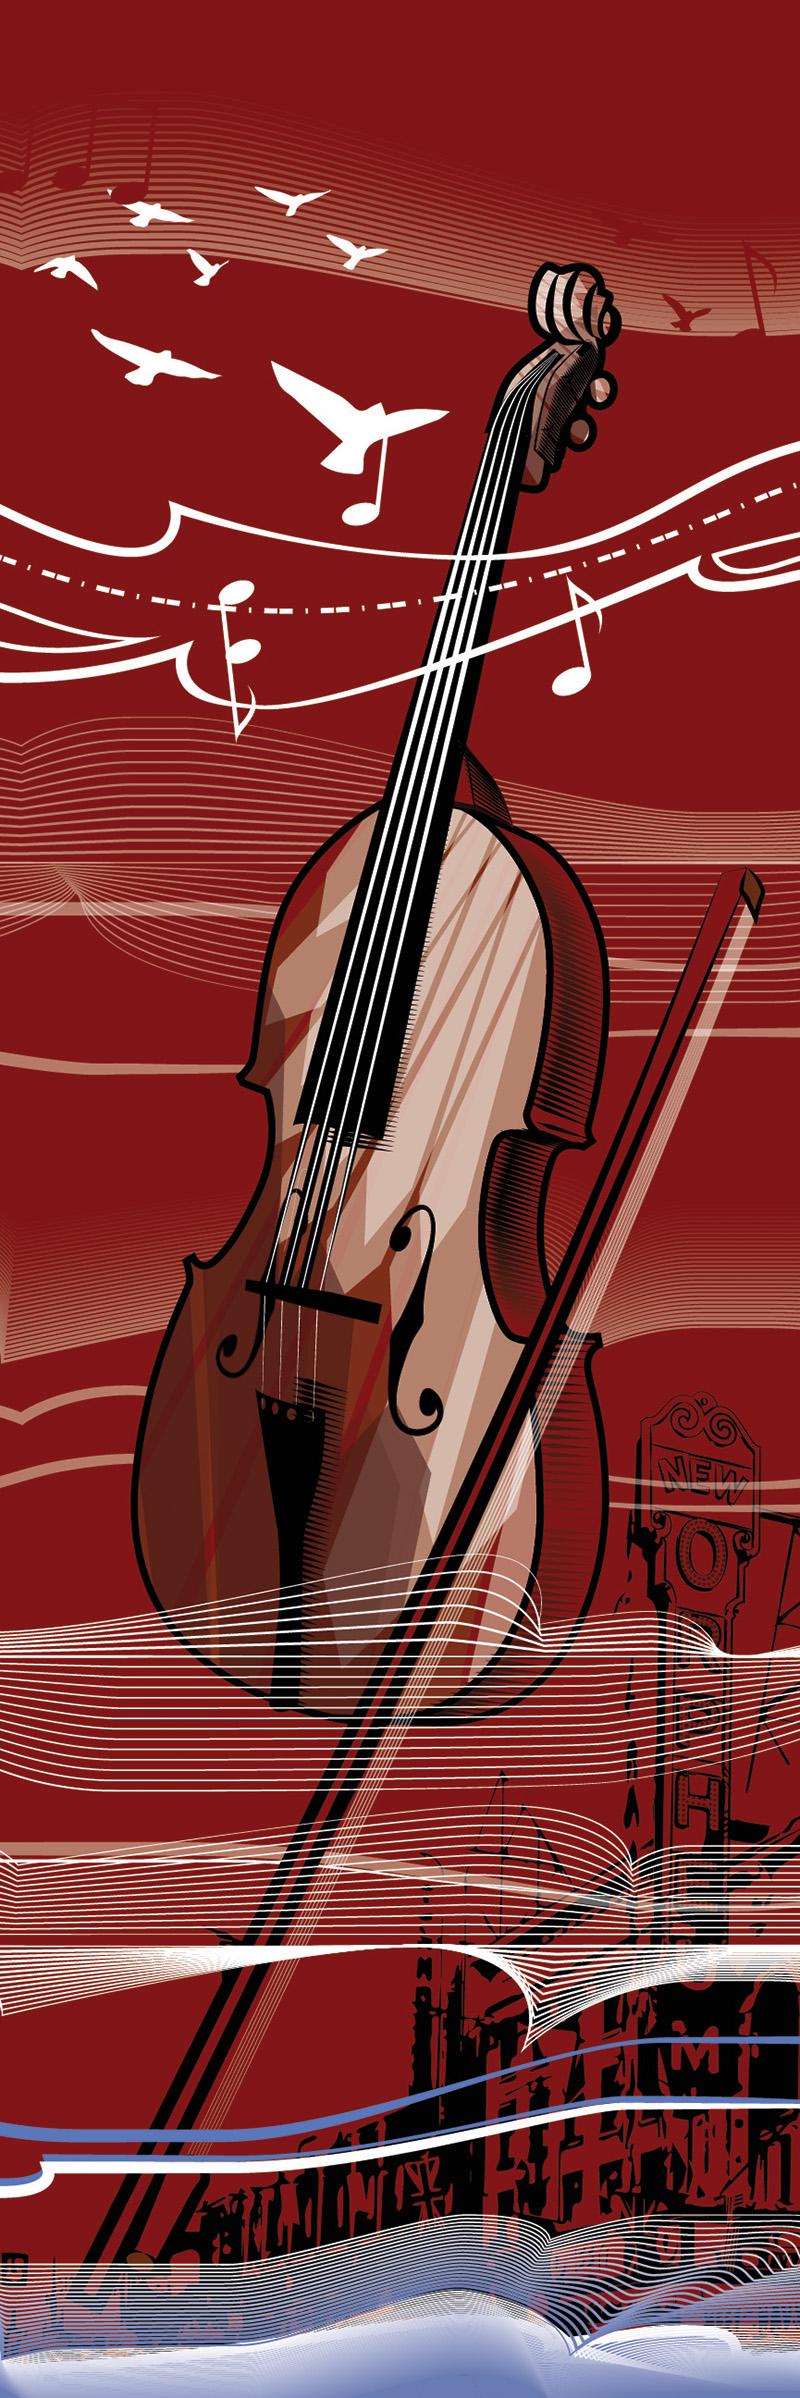 Forgotten City: Violin print